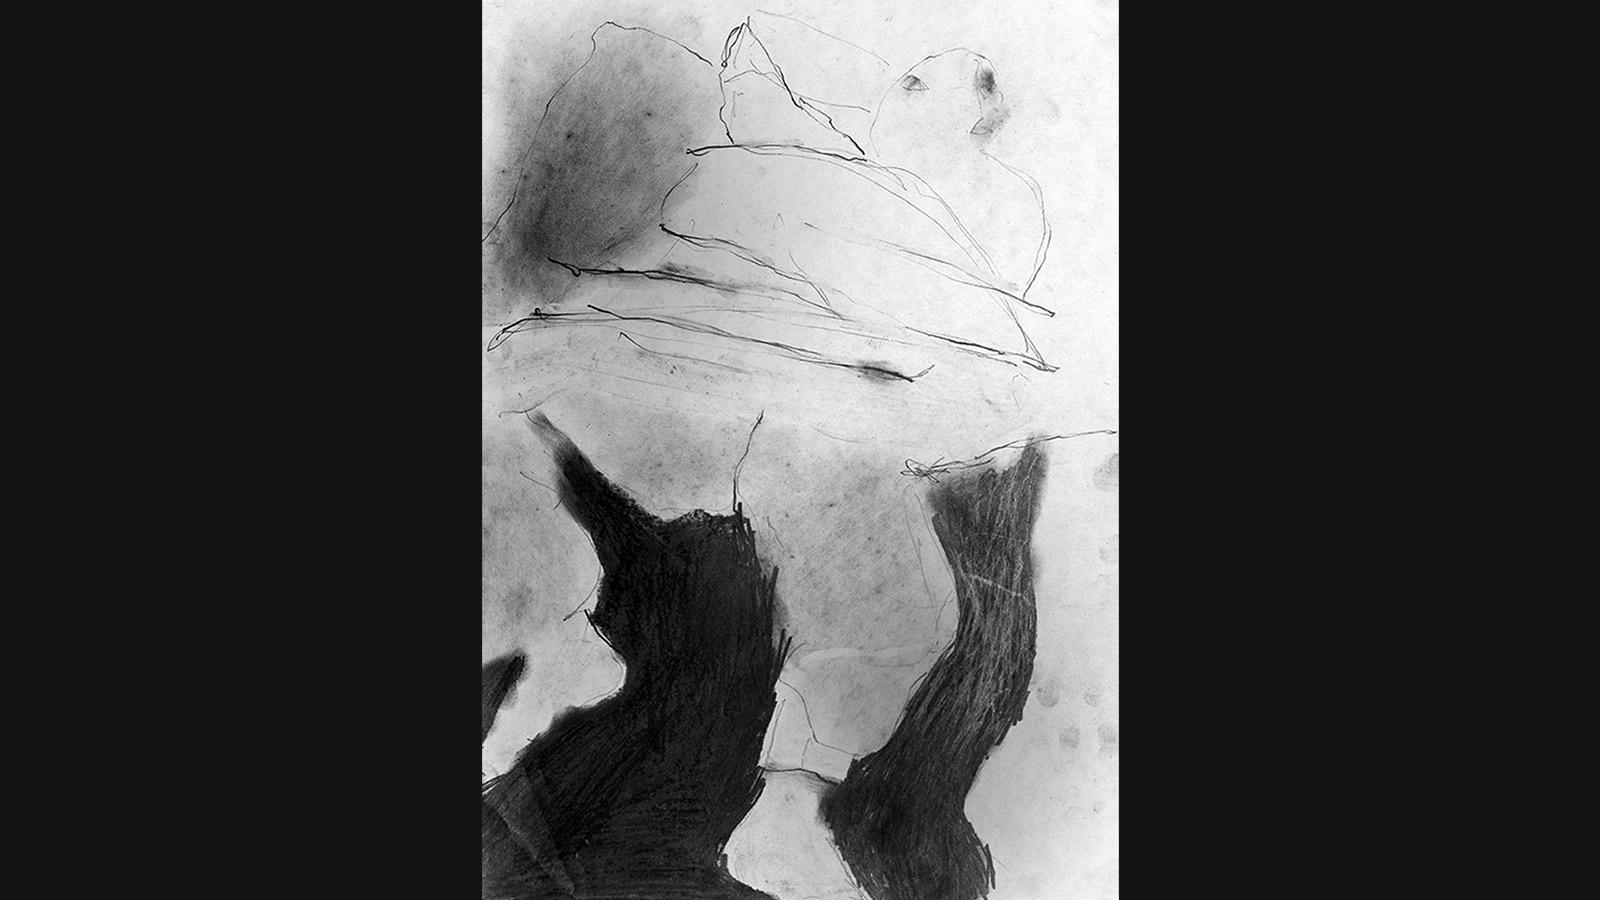 goran despotovski, room, drawings